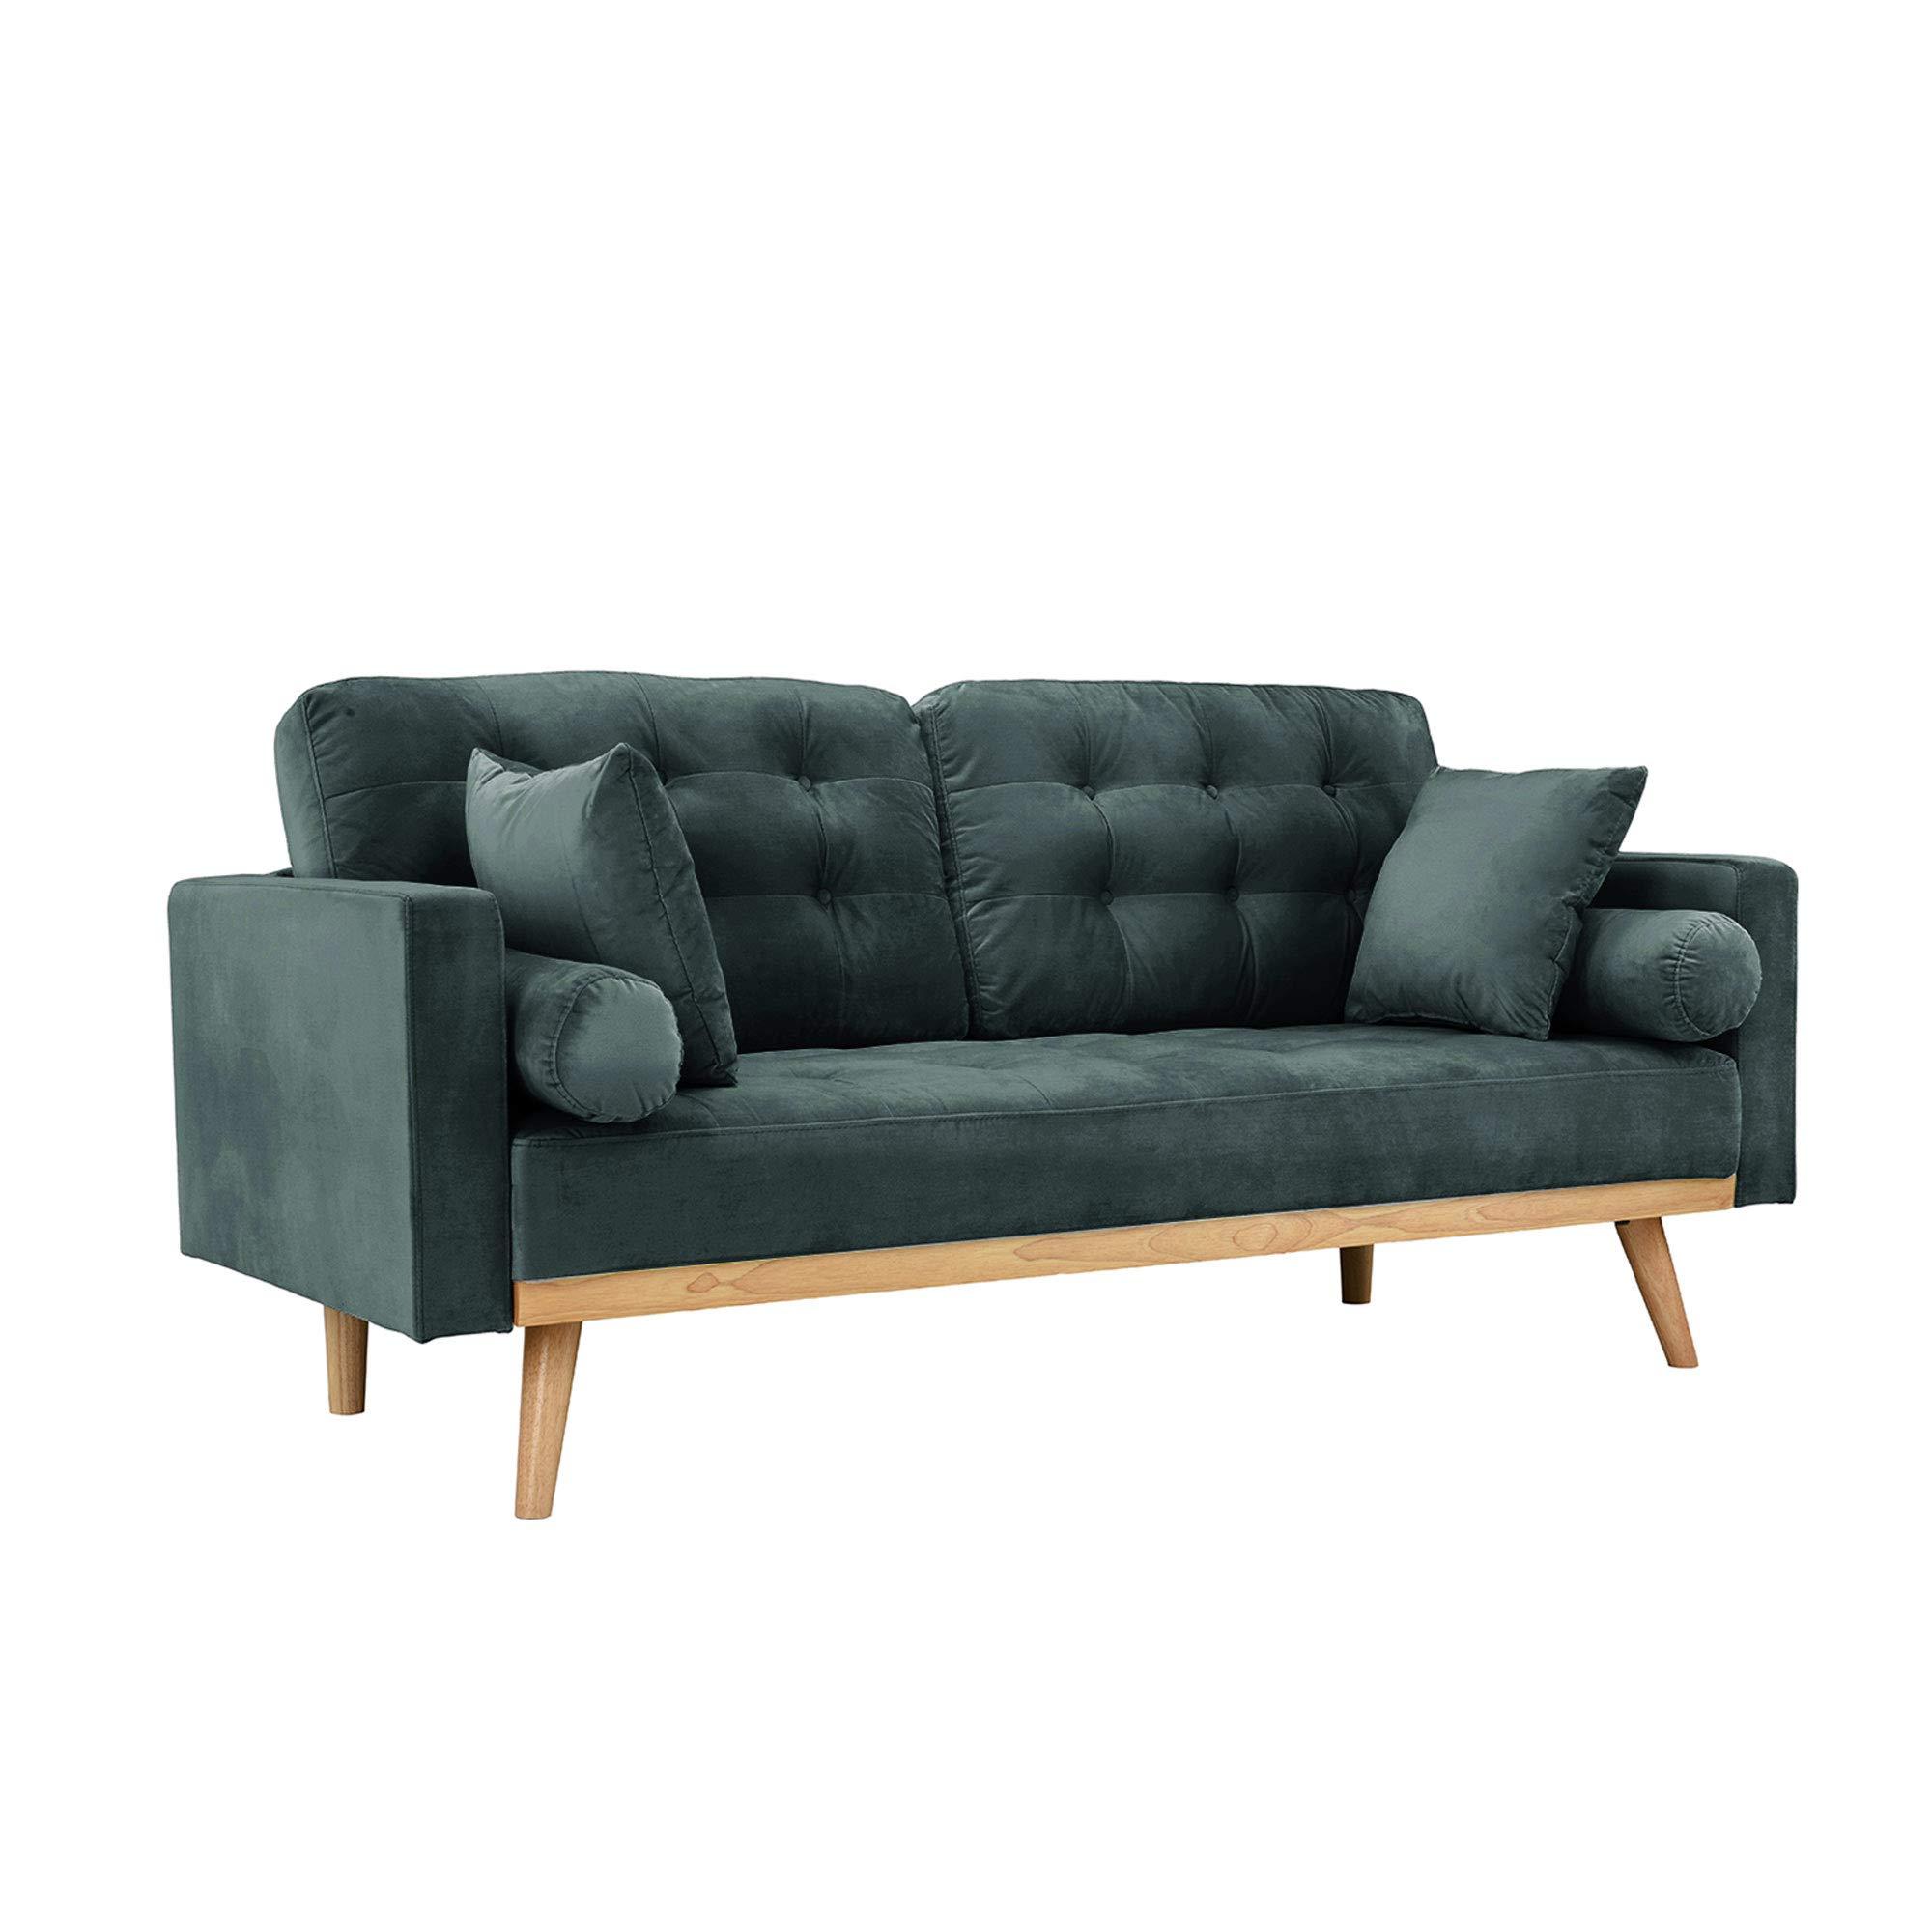 Casa Andrea Milano llc Mid Century Modern Tufted Upholstered Fabric Sofa Couch, Dark Grey Velvet